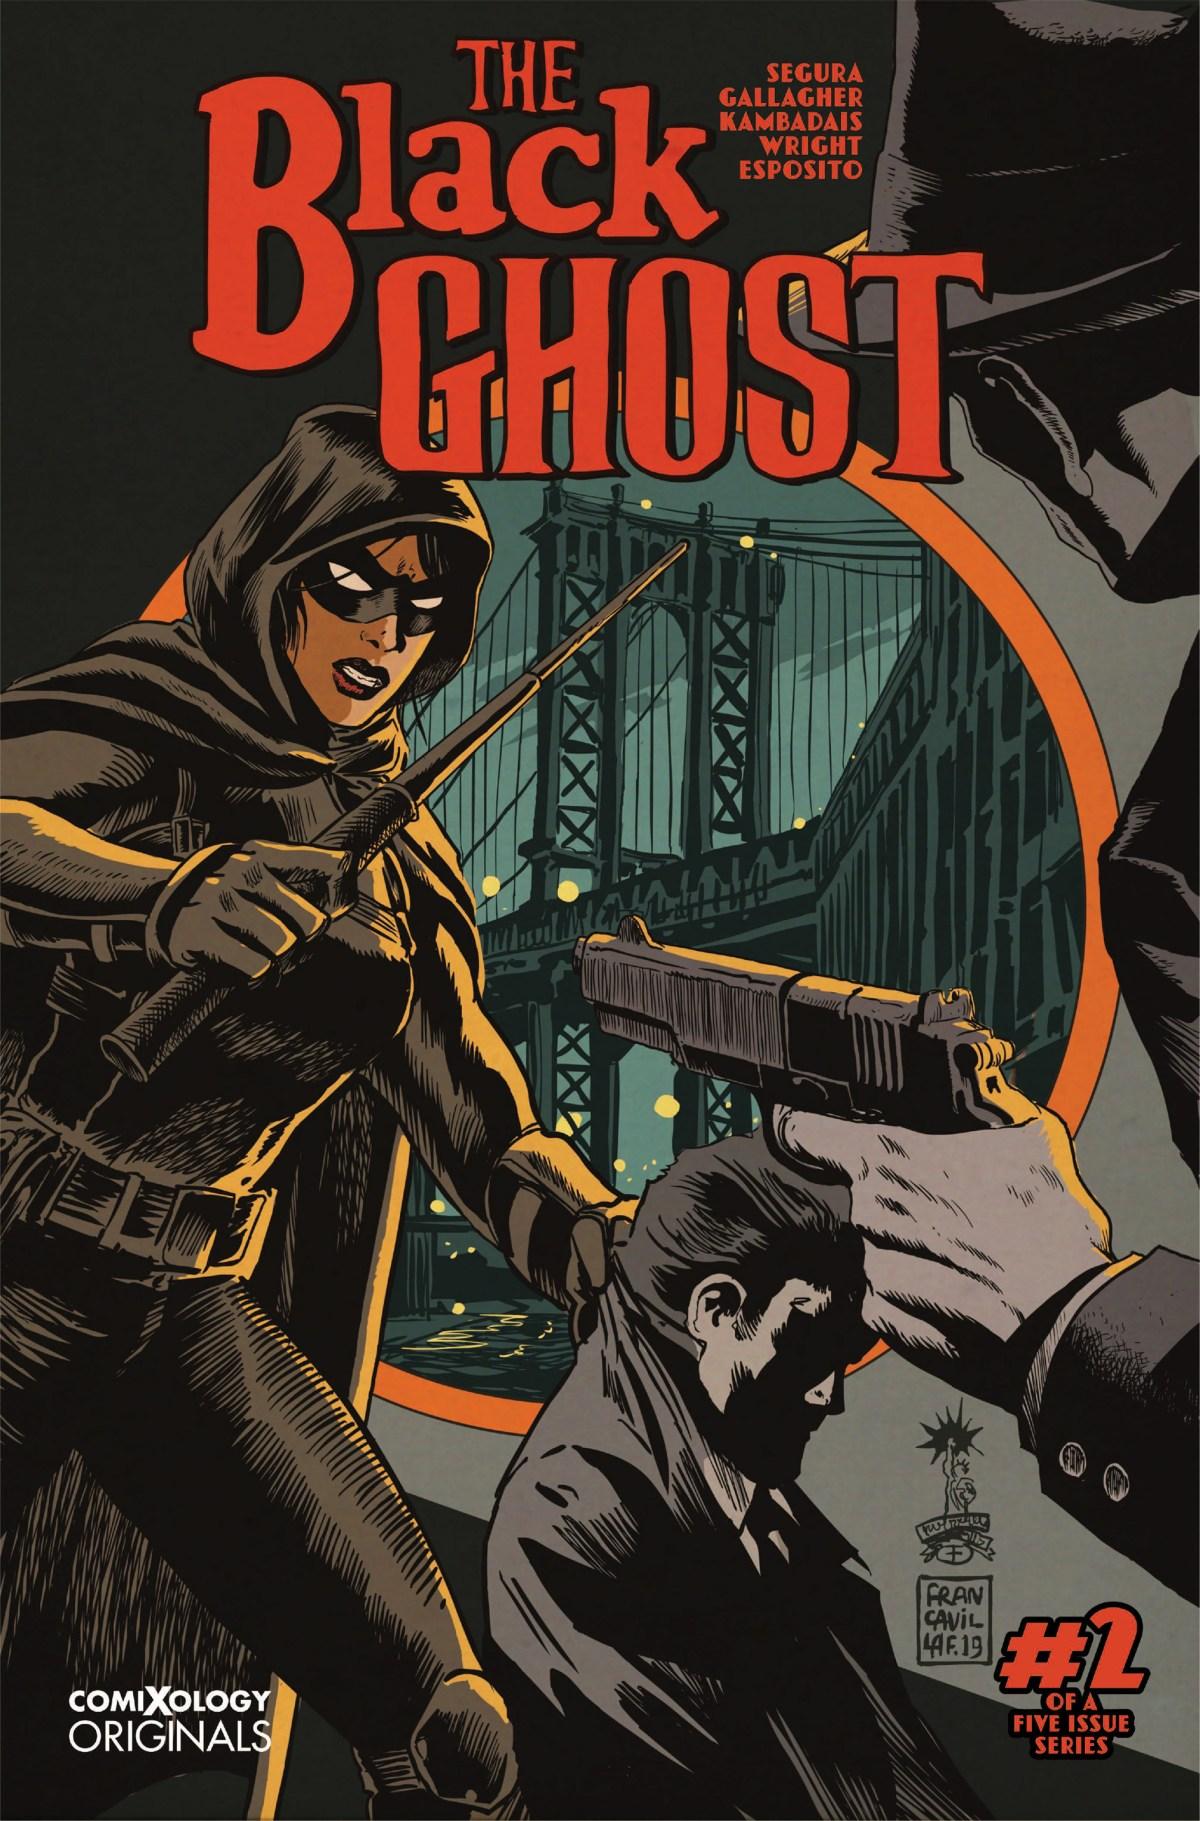 #2 Cover; New Wave Comics, 2019.